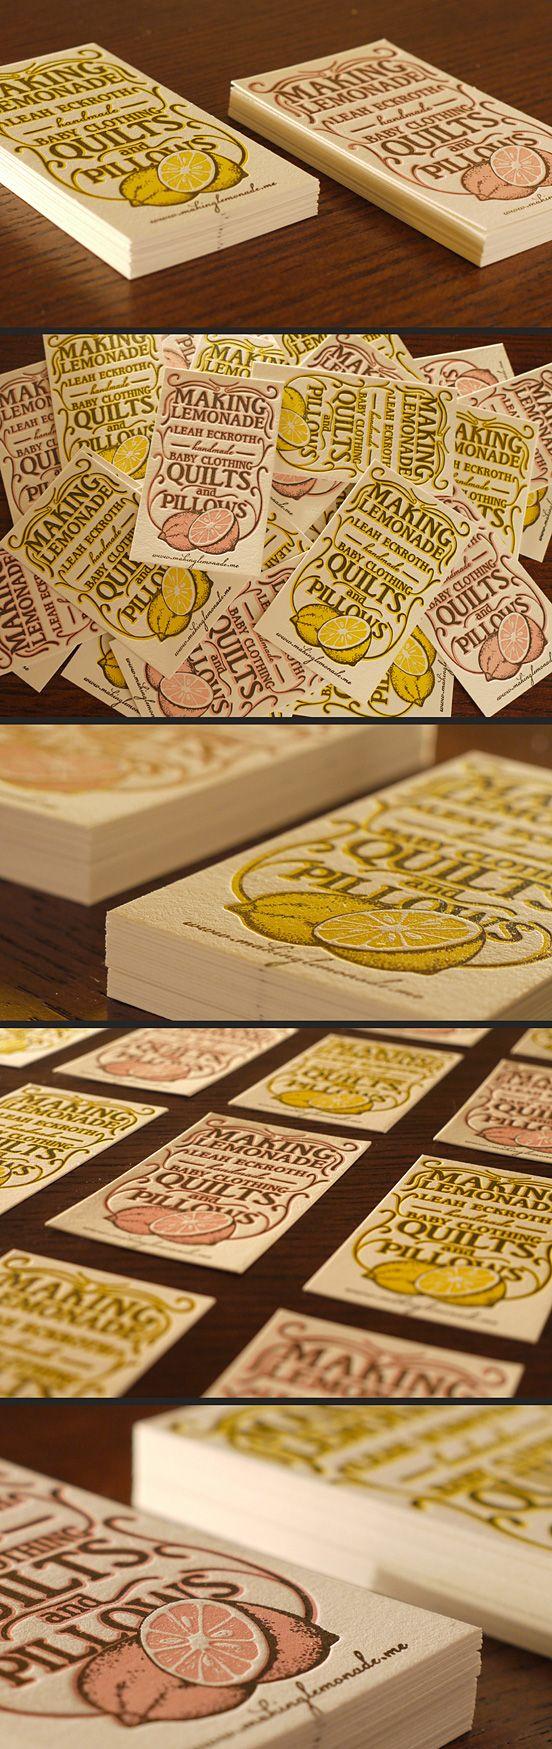 25 Illustration Based Business Card Designs | inspirationfeed.com